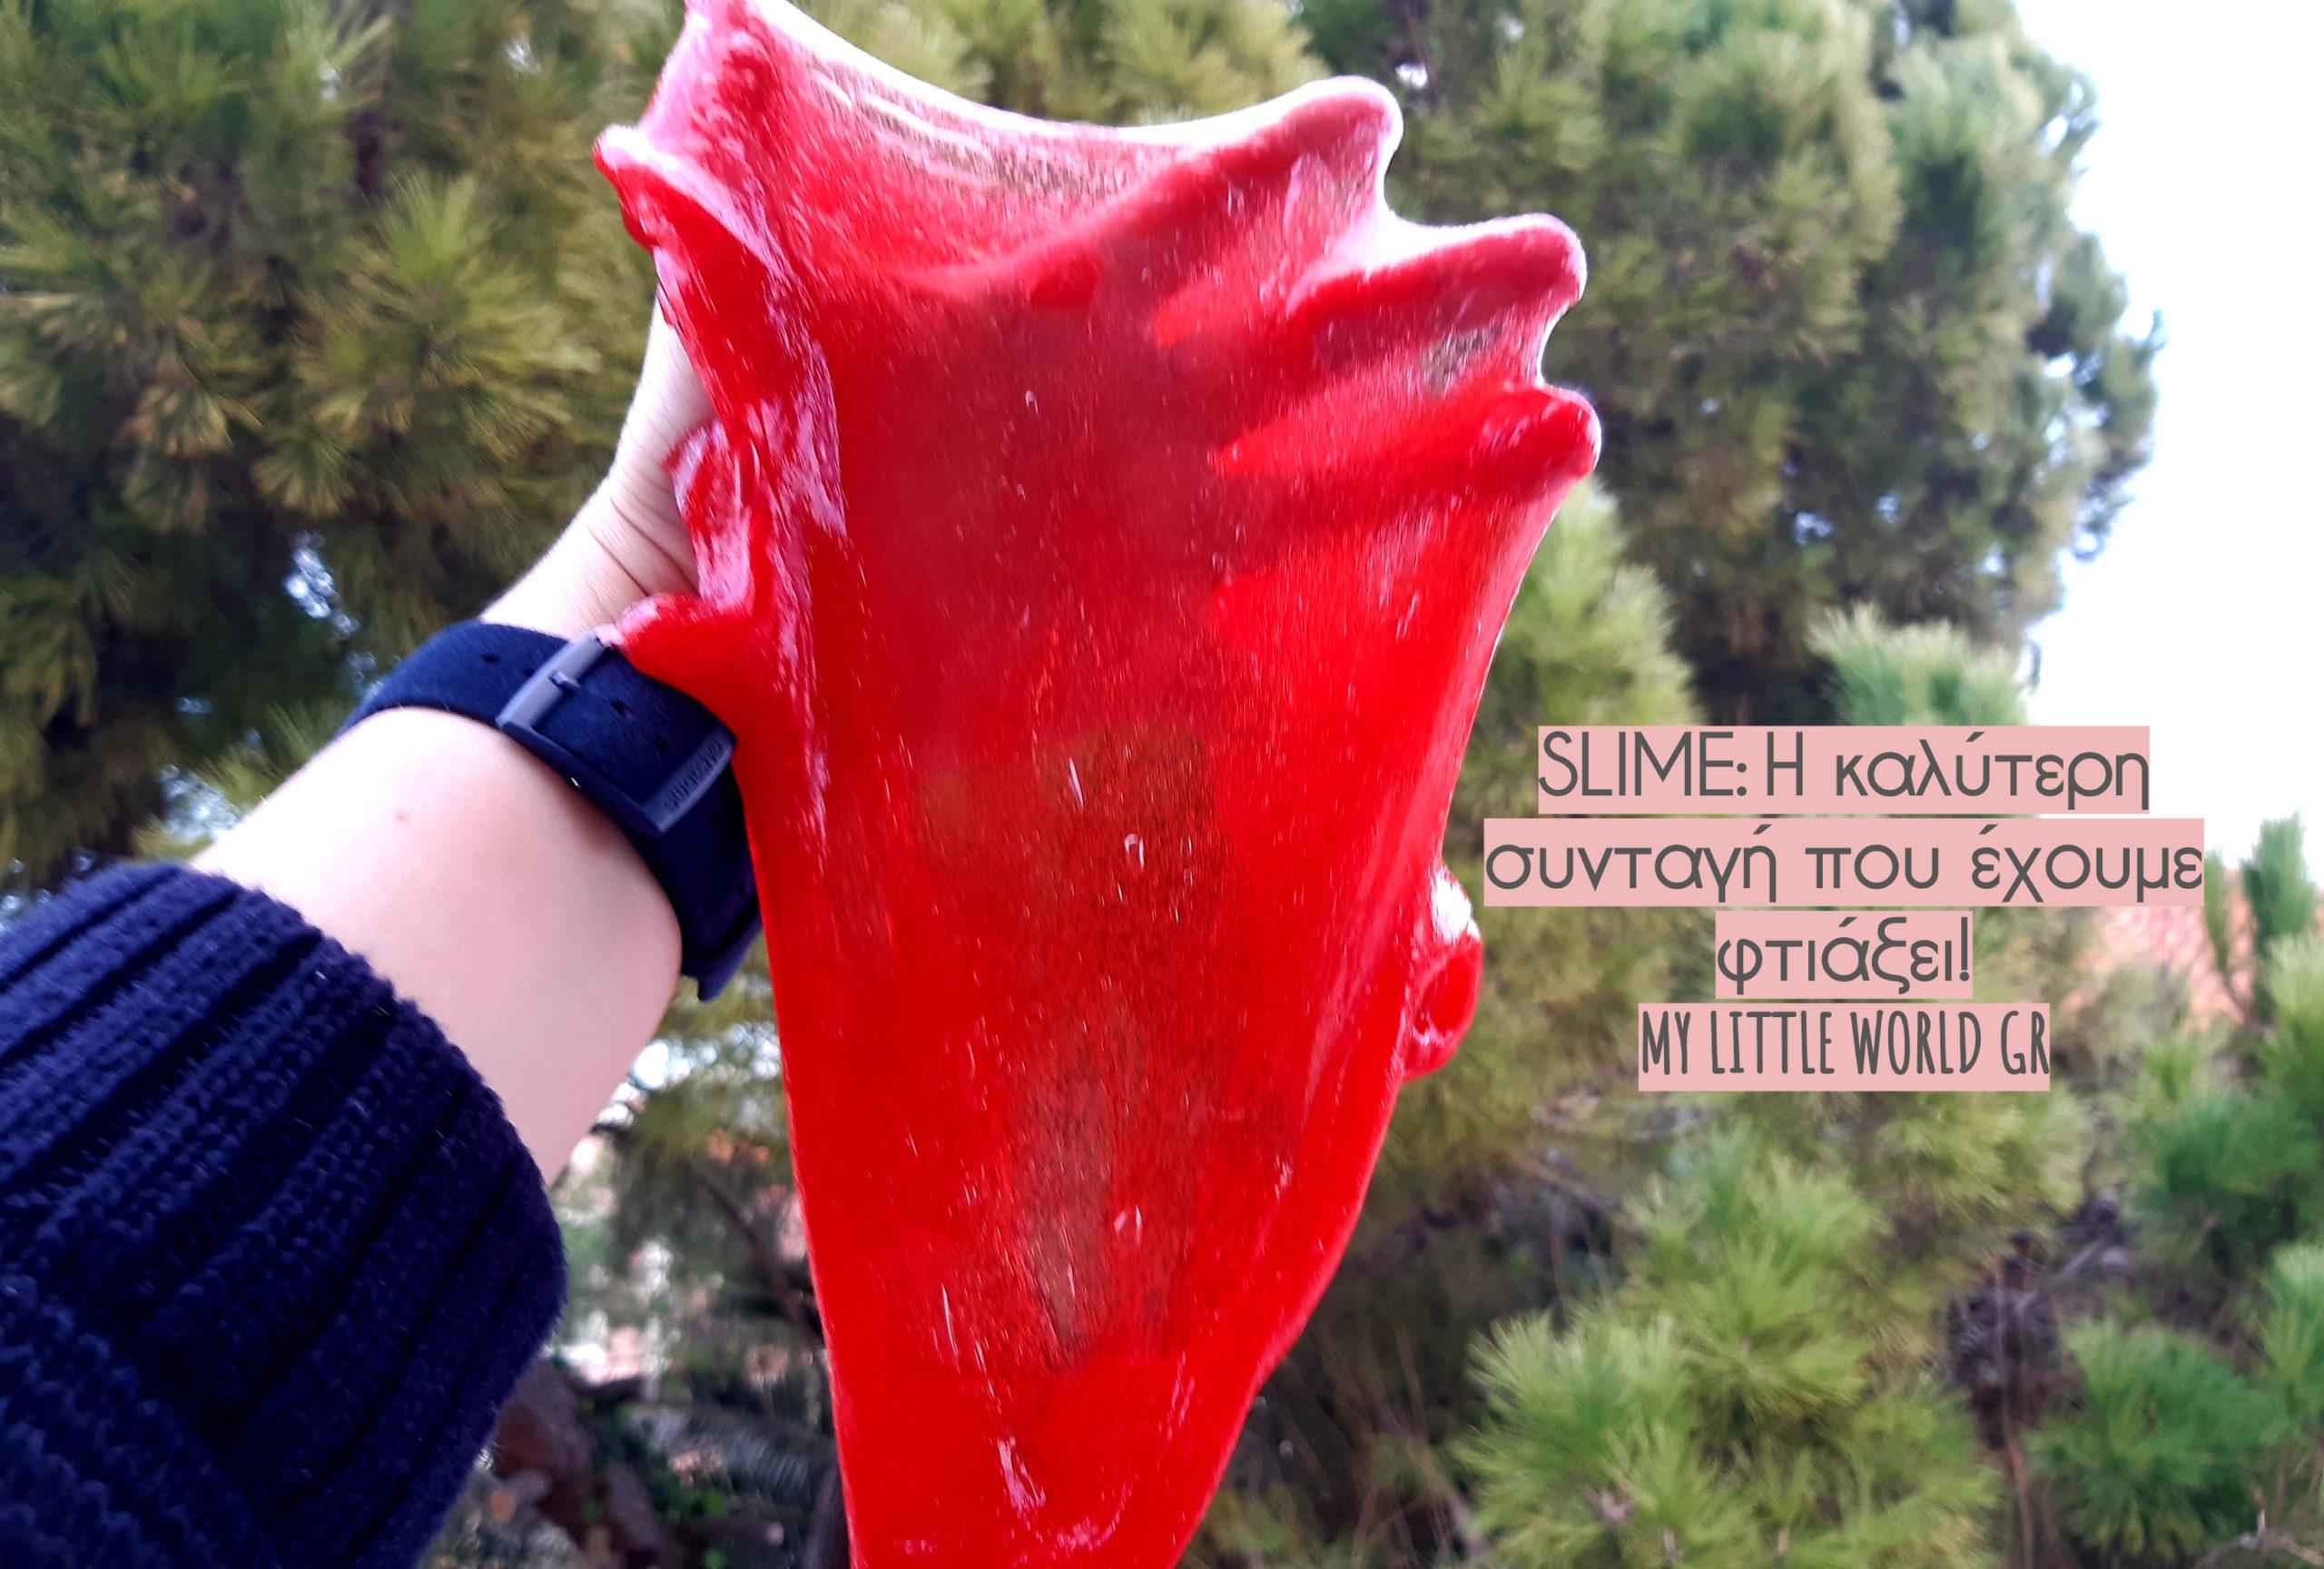 slime-η-καλύτερη-συνταγή-mylittleworldgr-8